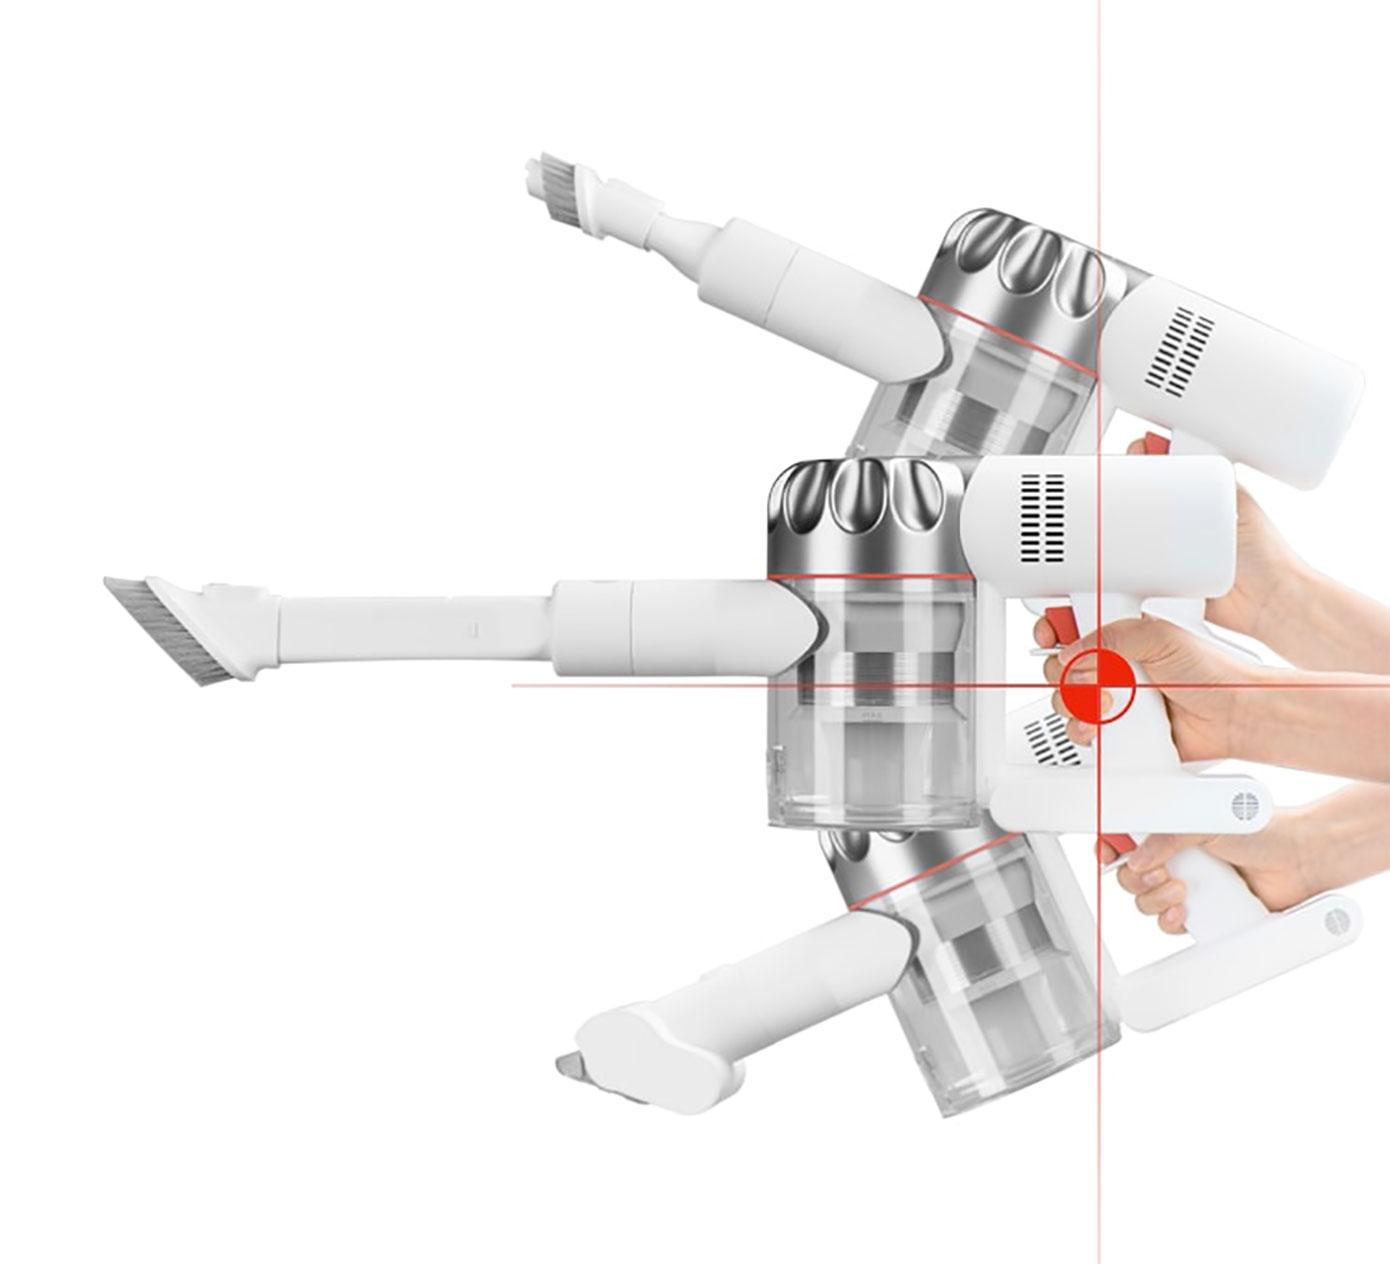 Opisanie Besprovodnoj Ruchnoj Pylesos Xiaomi Dreame V9p Wireless Vacuum Cleaner 07